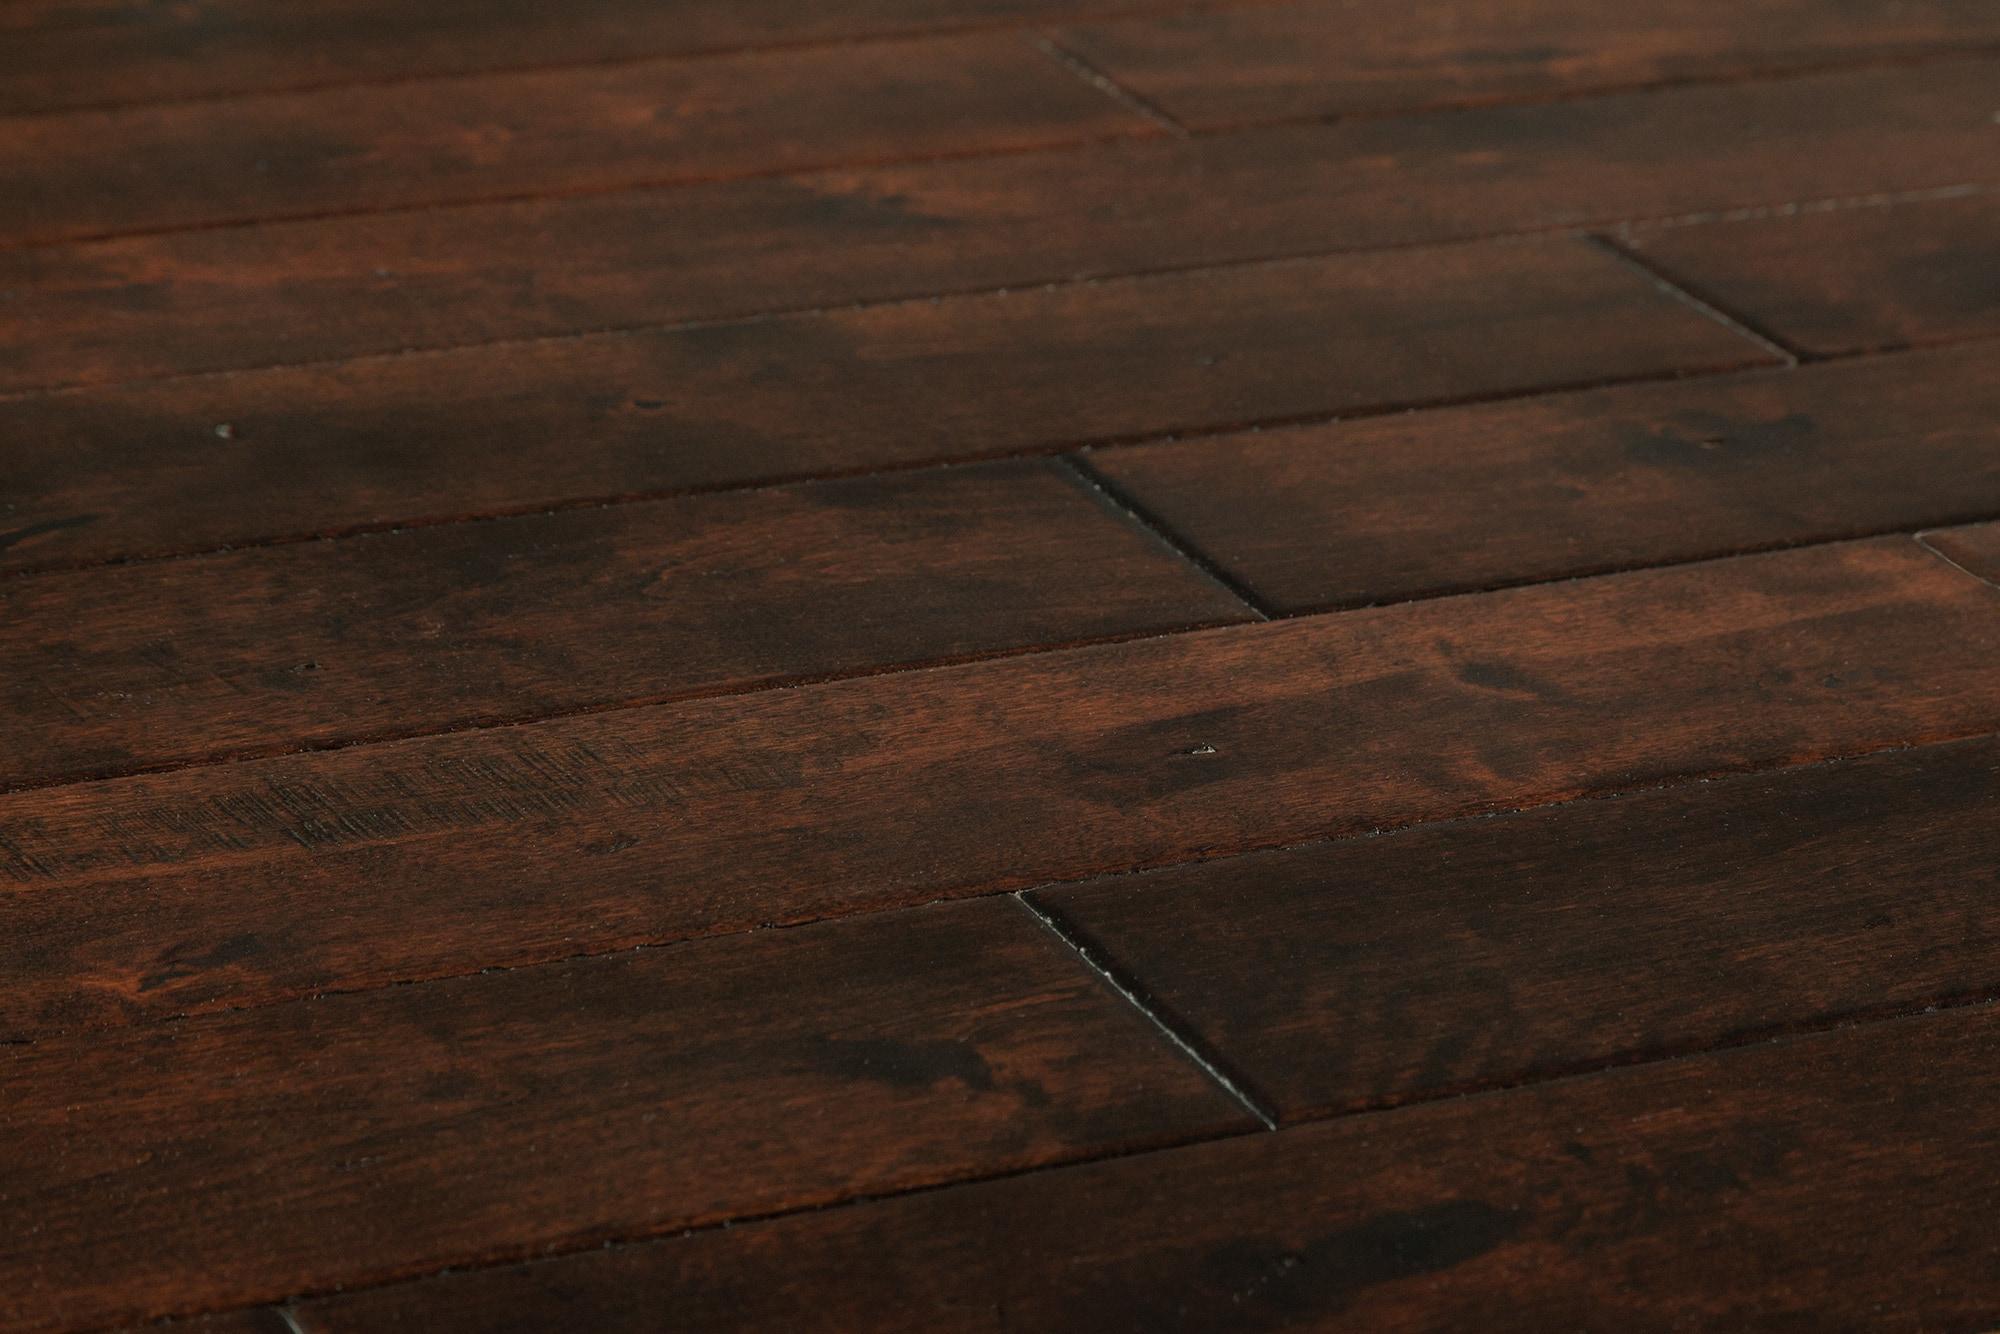 Cushty Jasper Hardwood Ing Classic Birch Collection Birch Hardwood Ing Free Samples Available At Chelsea Plank Ing Buckskin Hickory Chelsea Plank Ing Cumberland Gap houzz-03 Chelsea Plank Flooring